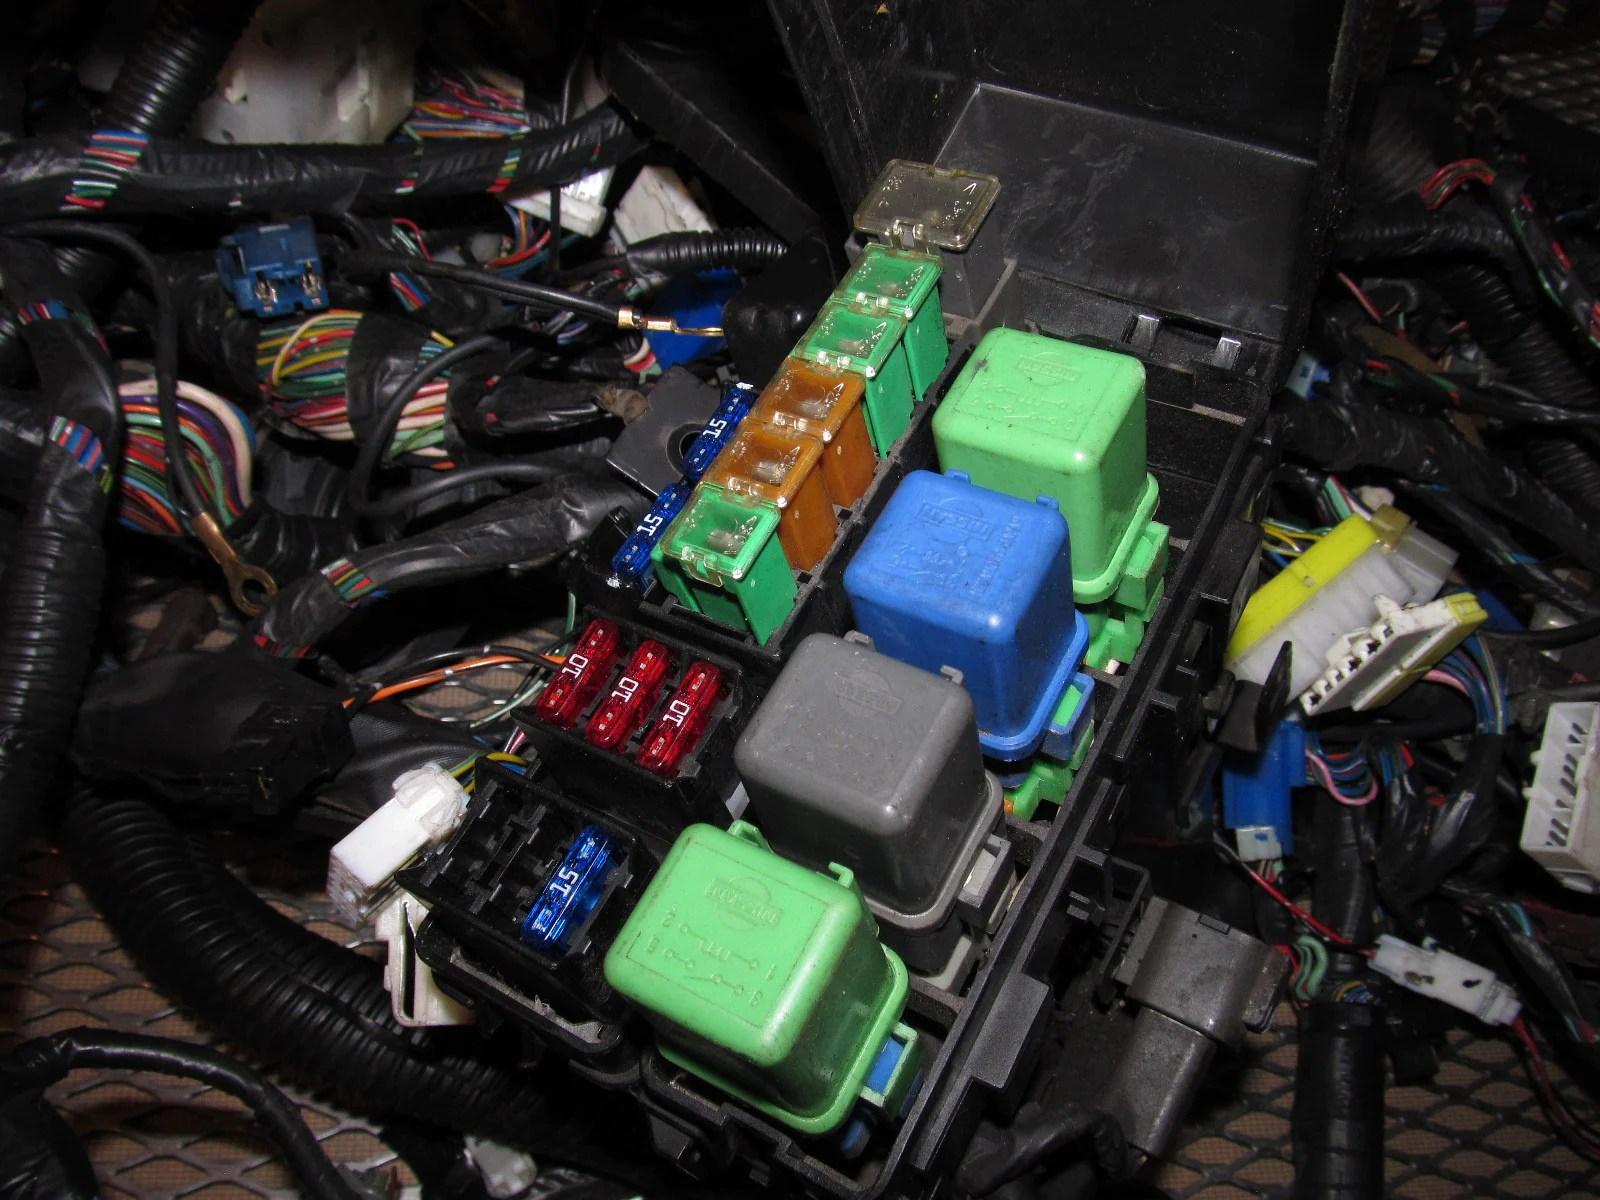 hight resolution of nissan 97 240sx fuse box wiring diagram technic 1996 nissan 240sx fuse box